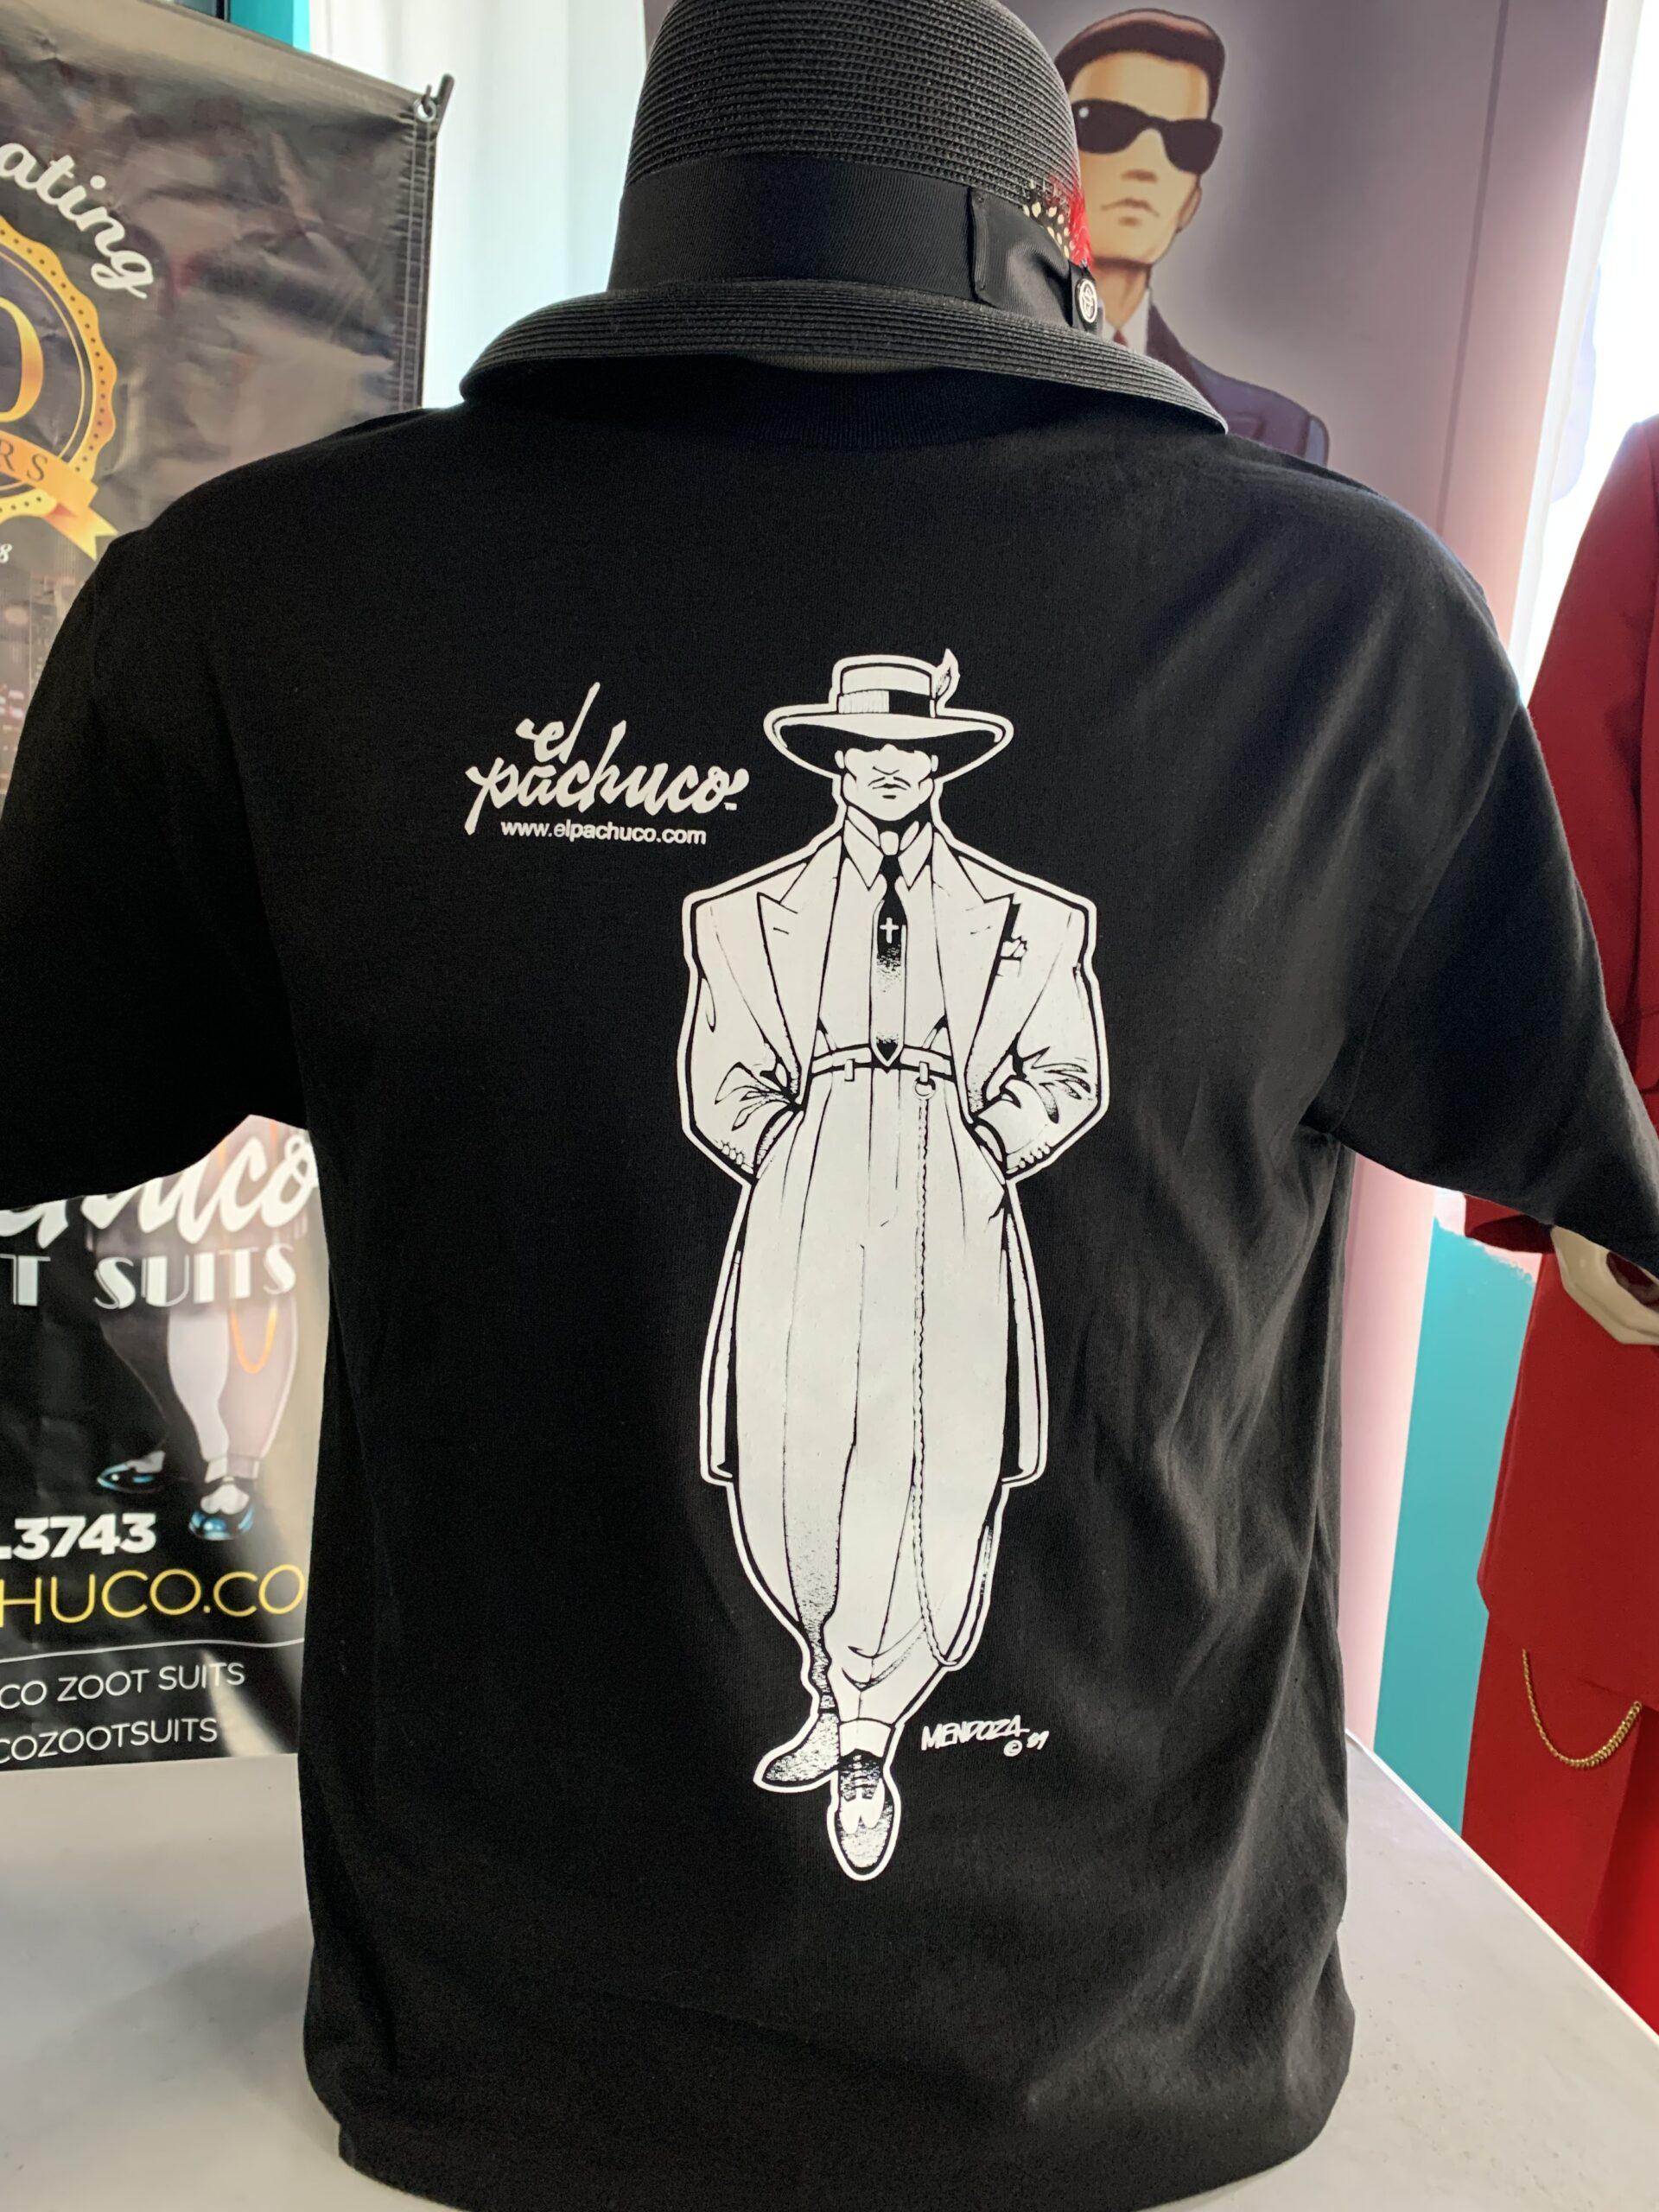 OG PACHUCO T-shirt